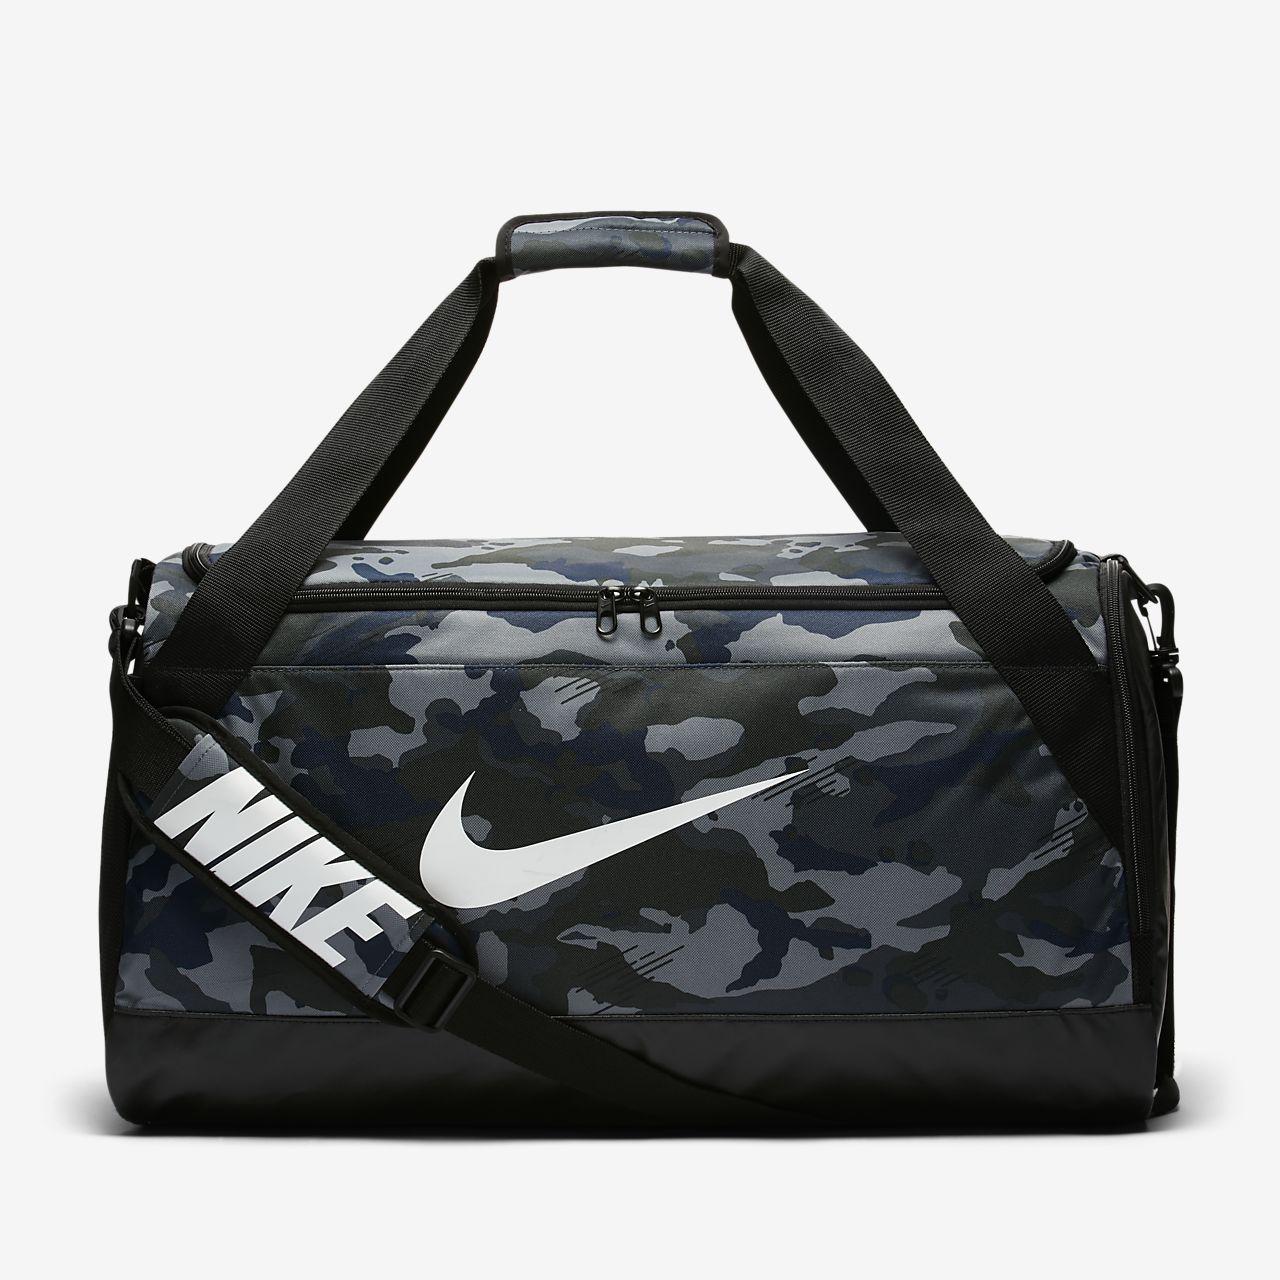 b0edc2cec7 Nike Brasilia (Medium) Training Duffel Bag. Nike.com BE